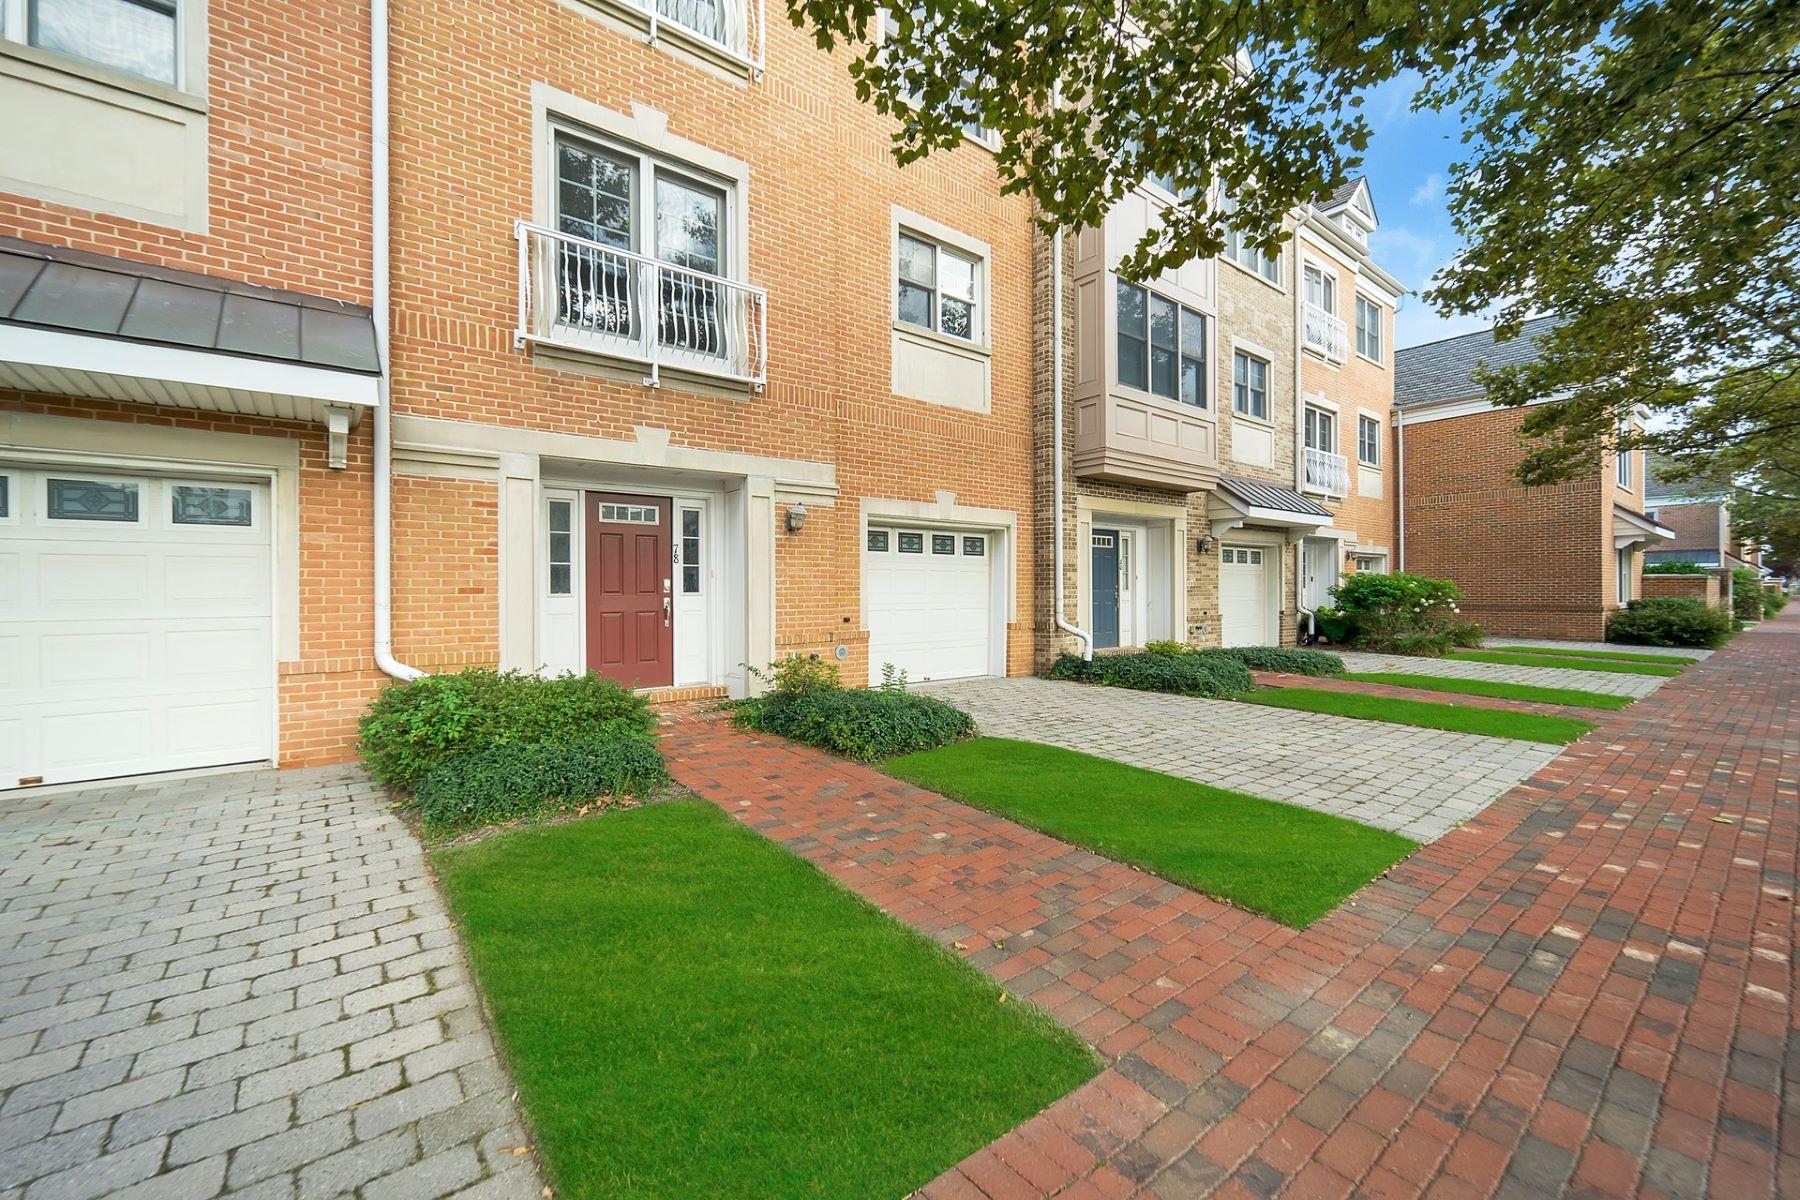 townhouses для того Продажа на STUNNING WATERFRONT TOWNHOME 78 Constitution Way #PH, Jersey City, Нью-Джерси 07305 Соединенные Штаты